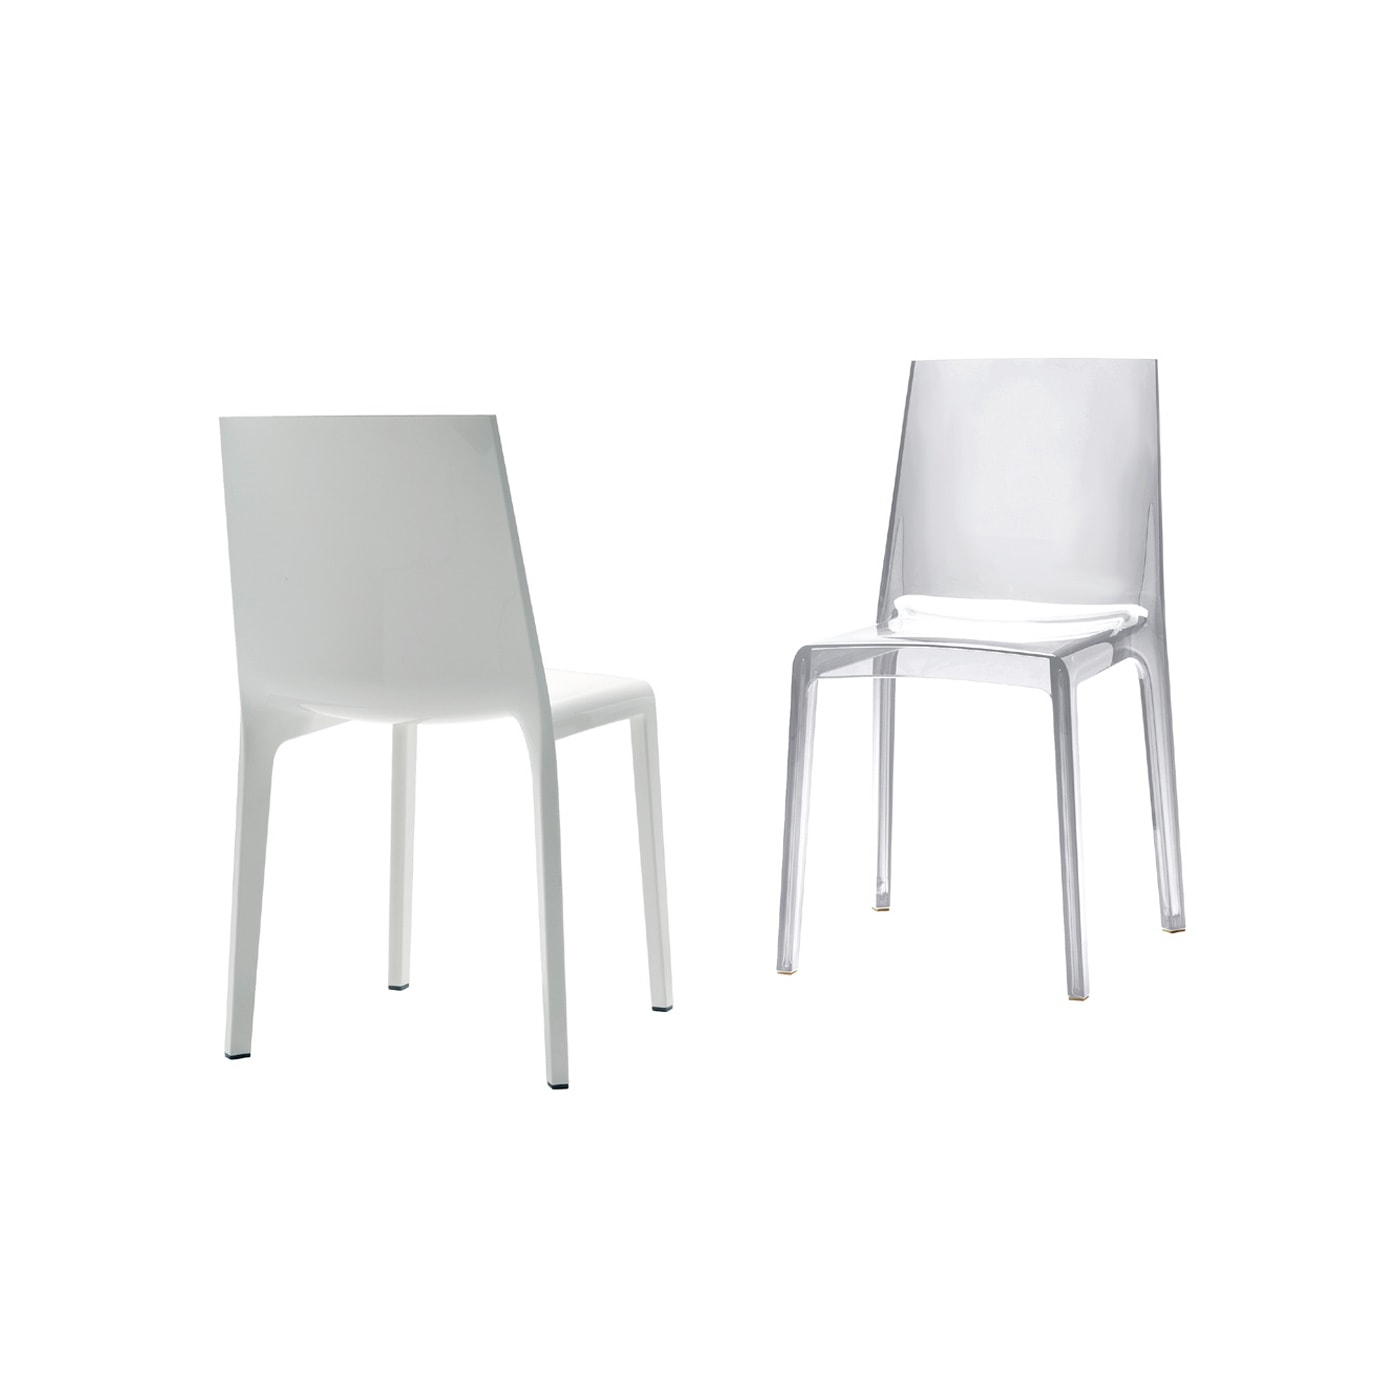 Rexite Eveline sedia - vendita online